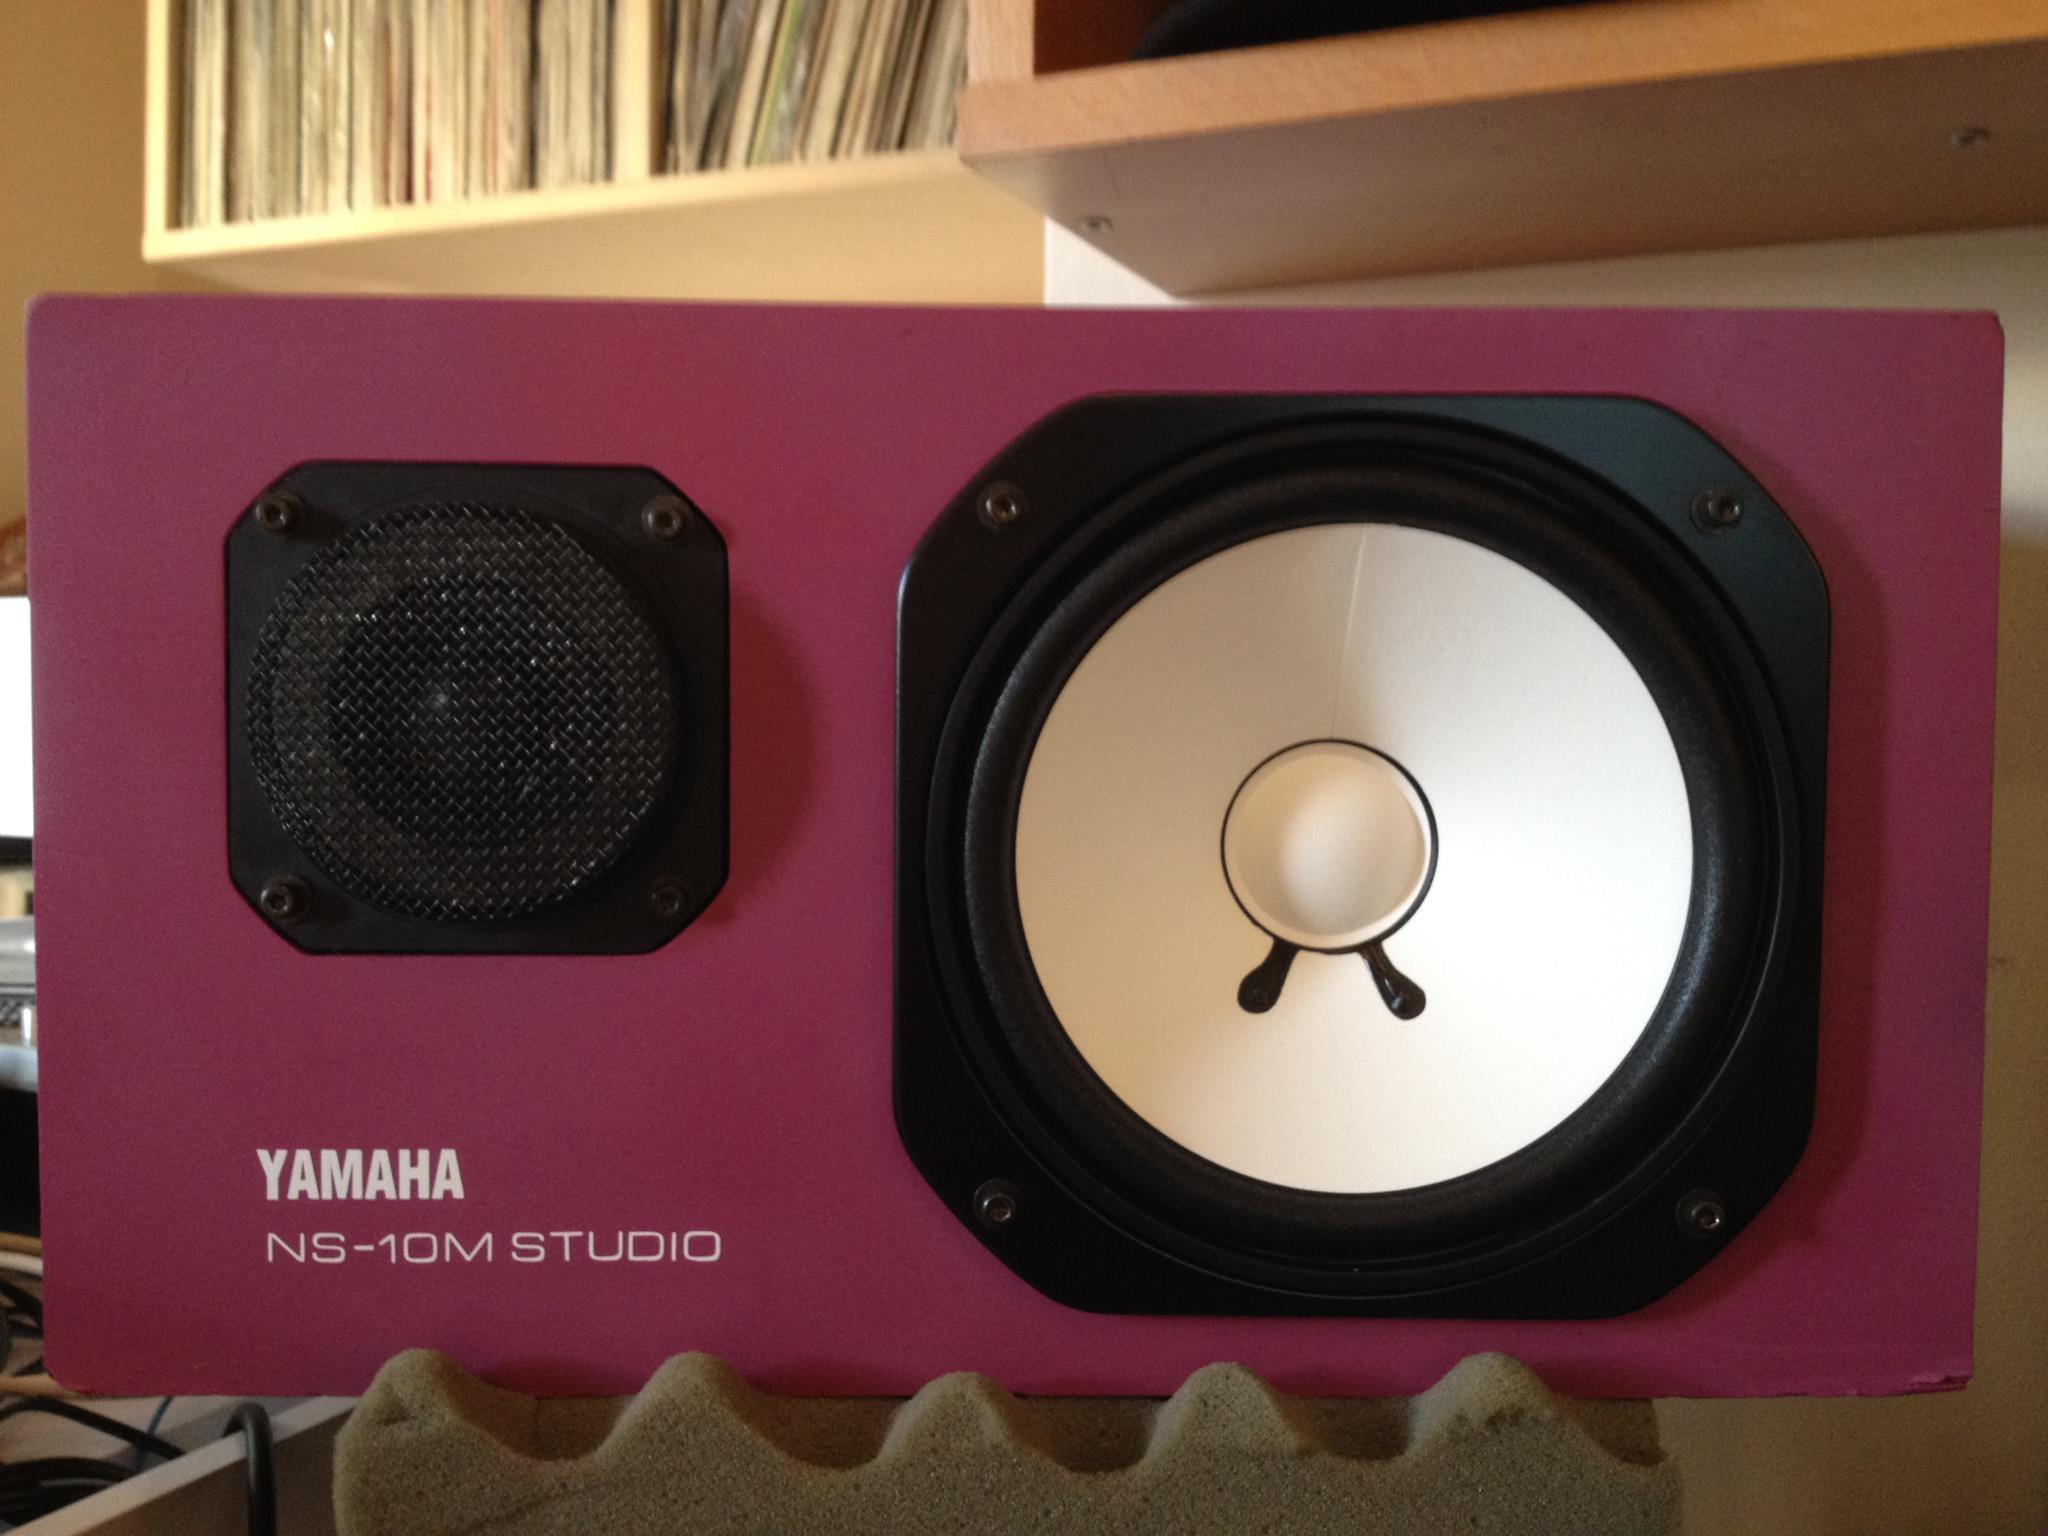 yamaha ns 10m studio image 2051381 audiofanzine. Black Bedroom Furniture Sets. Home Design Ideas